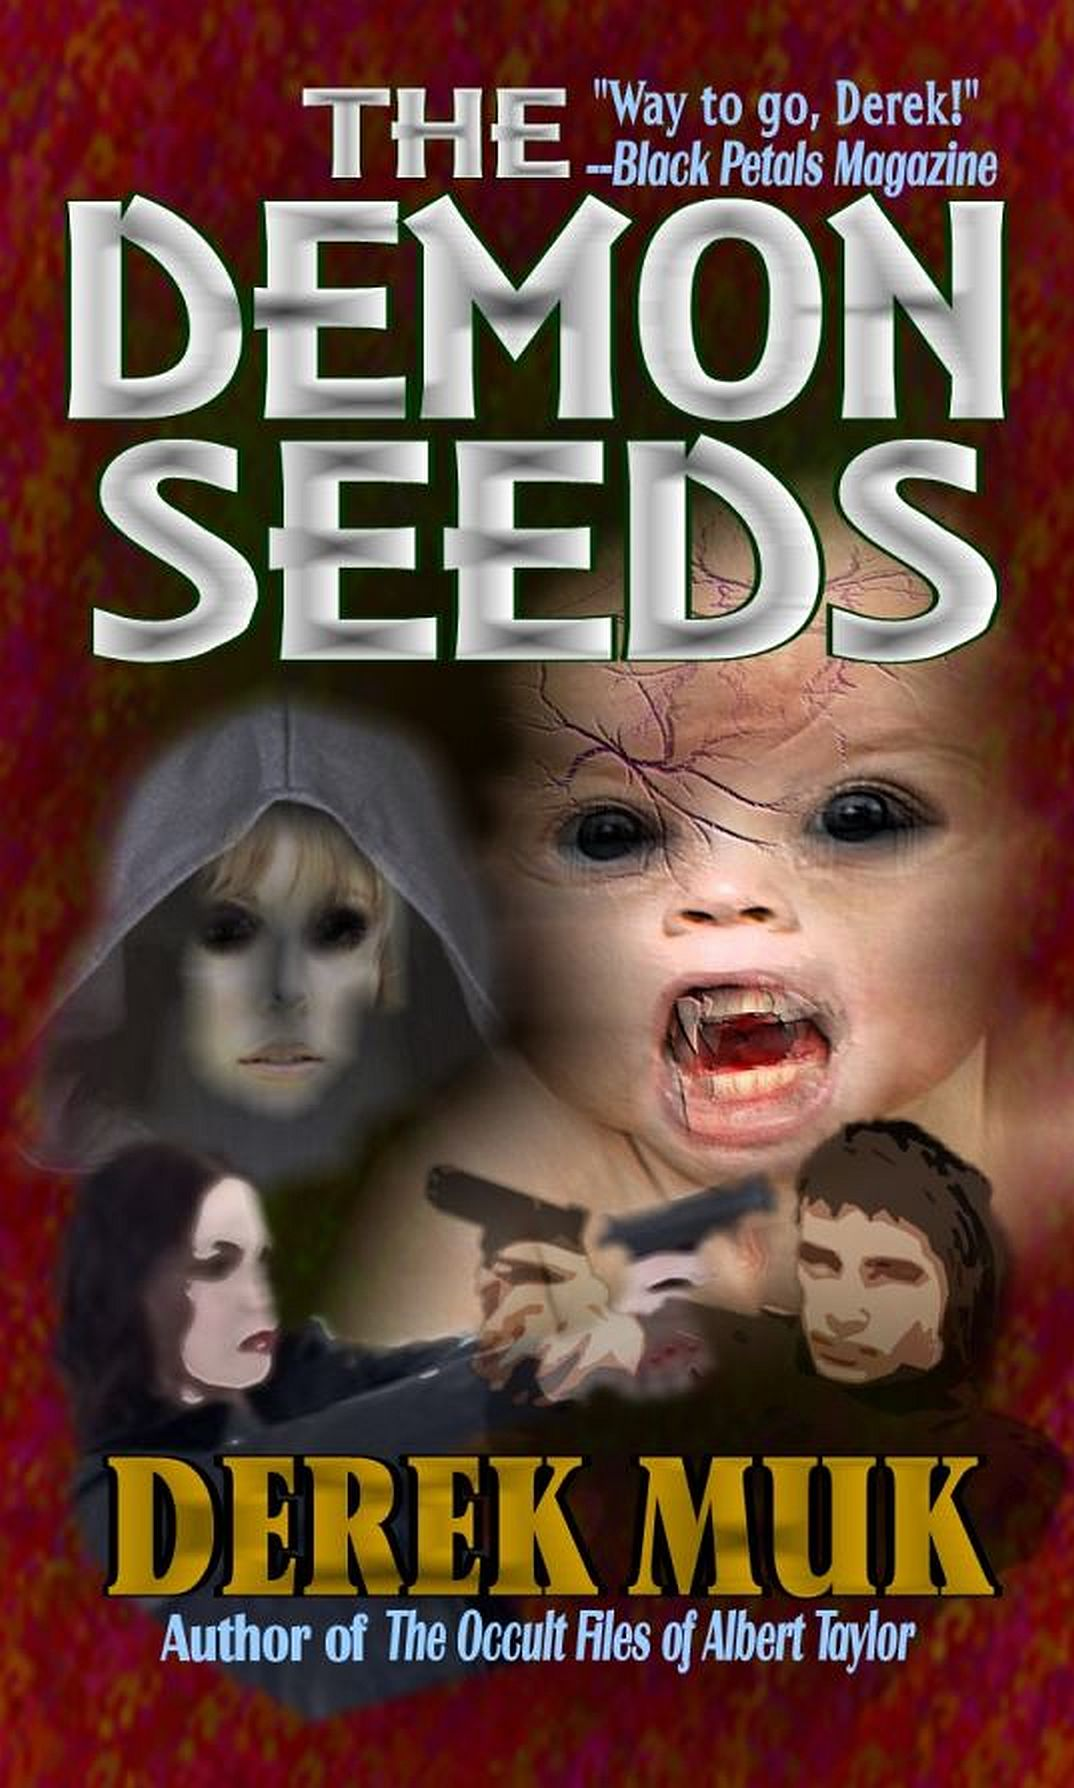 The Demon Seeds